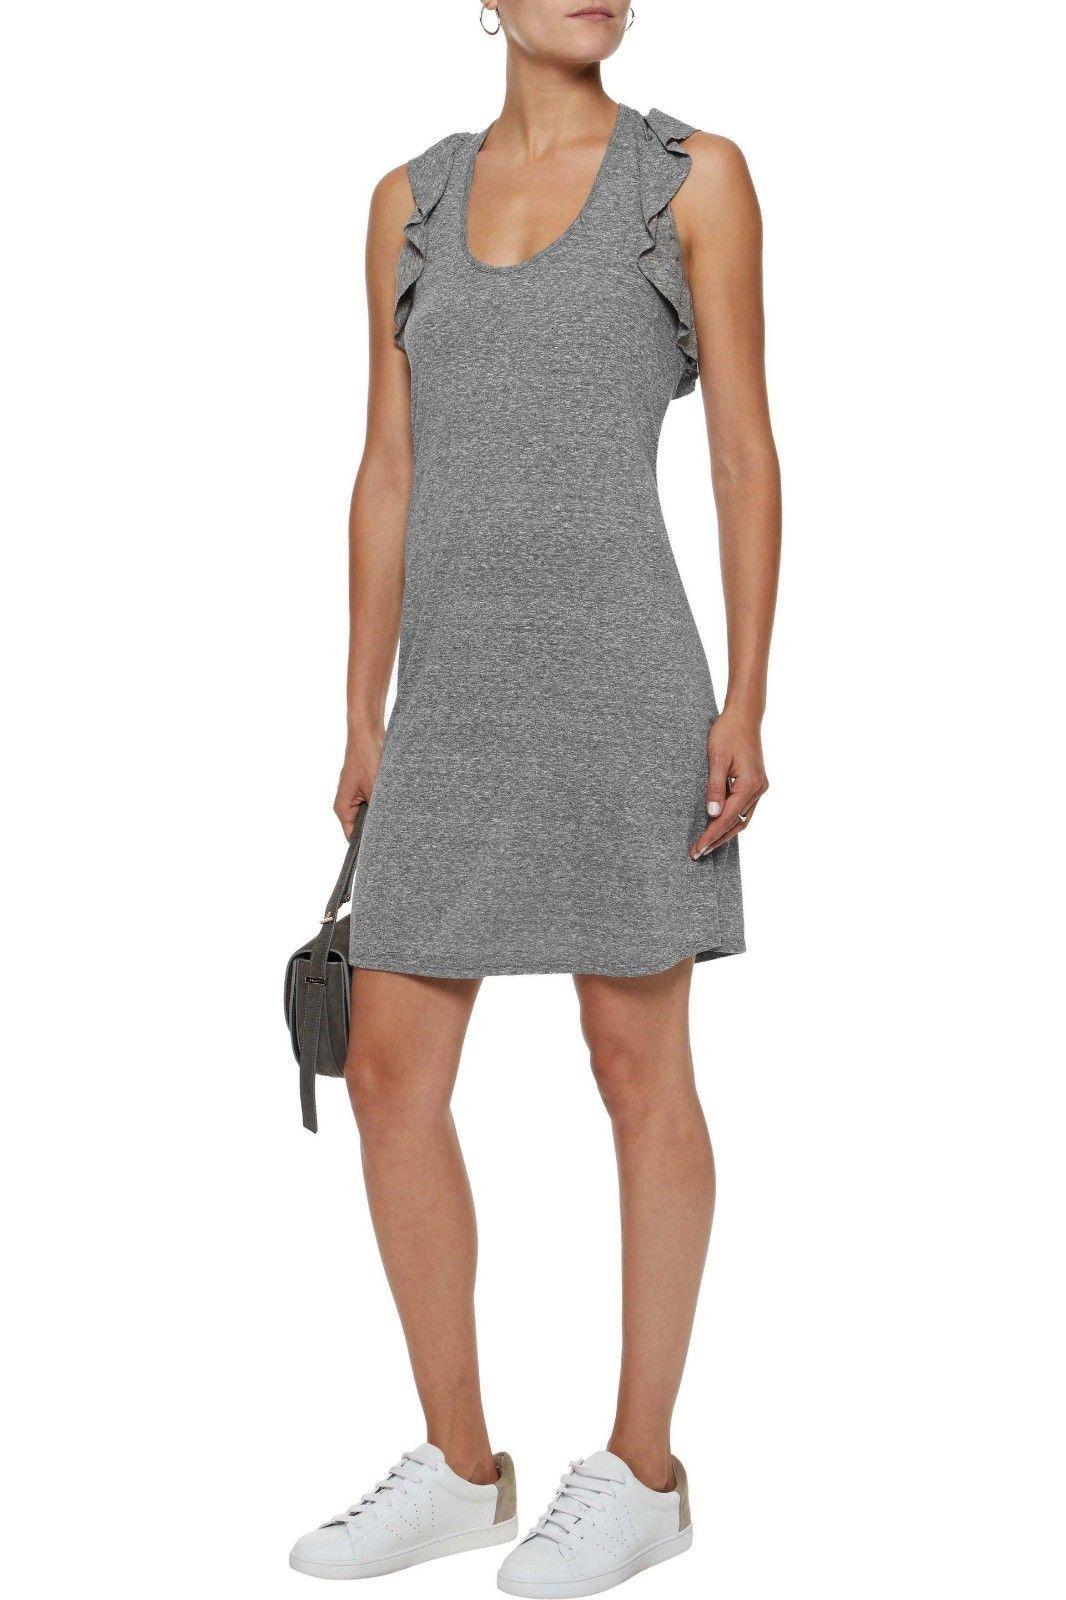 IRR Current Elliott Shirt Dress Ruffles The Cadence Scoop-Neck Heathered  *1